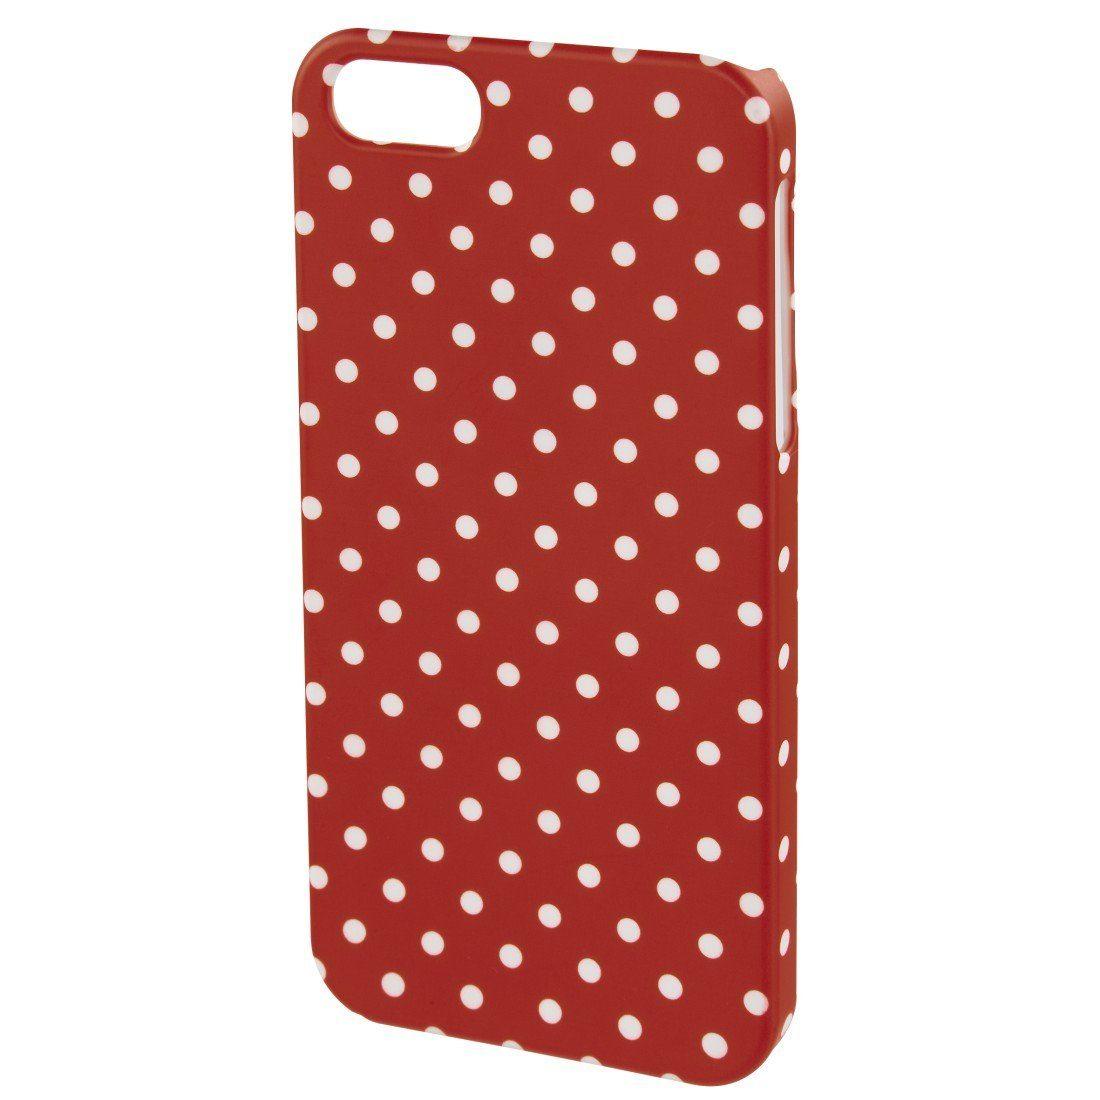 Hama Cover Polka Dots für Apple iPhone 6/6s, Rot/Weiß